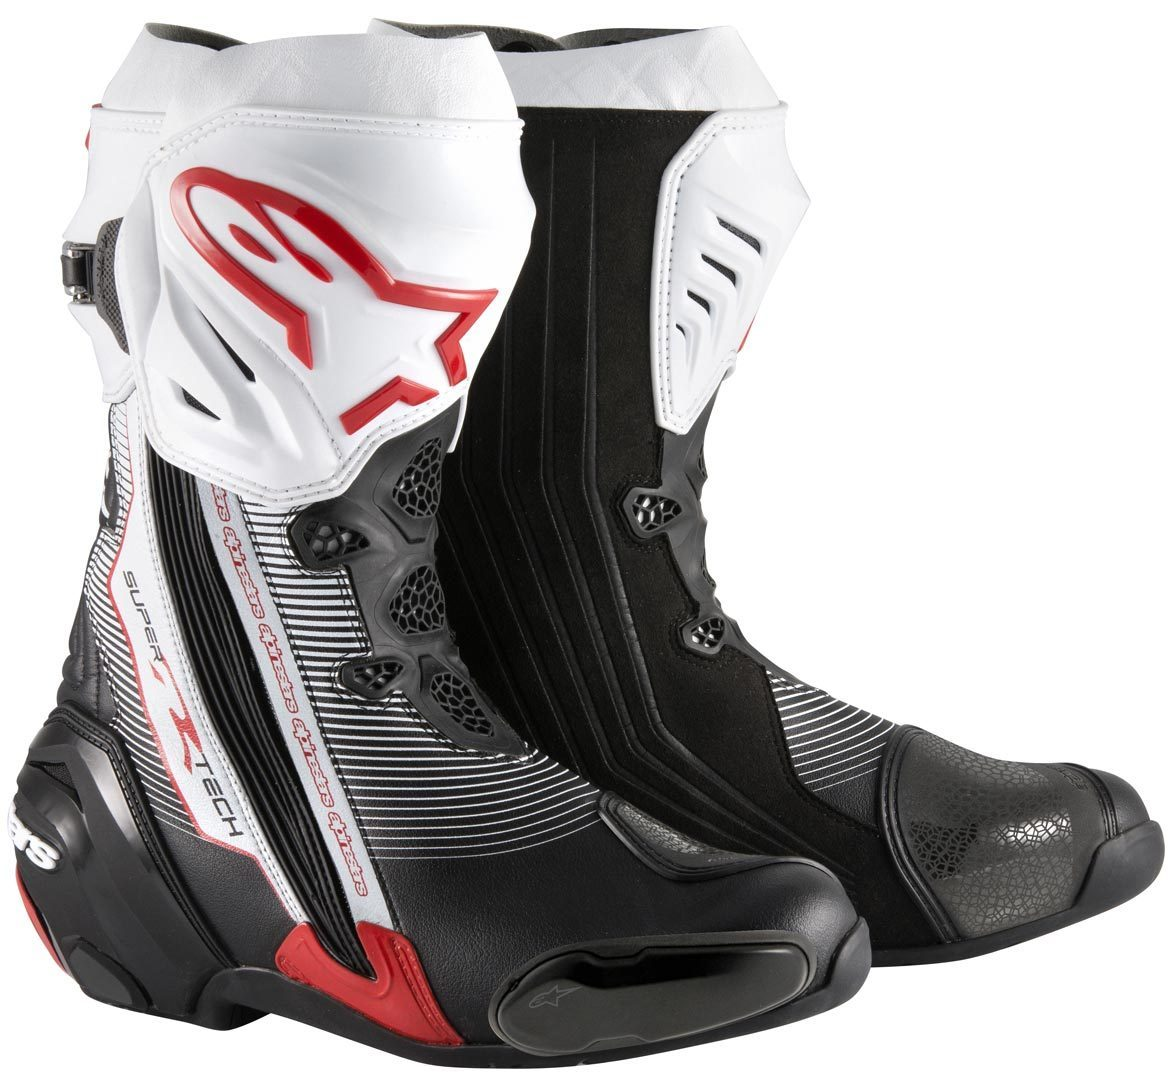 Bota Alpinestars Supertech R Vermelho (Esportiva)  - Super Bike - Loja Oficial Alpinestars